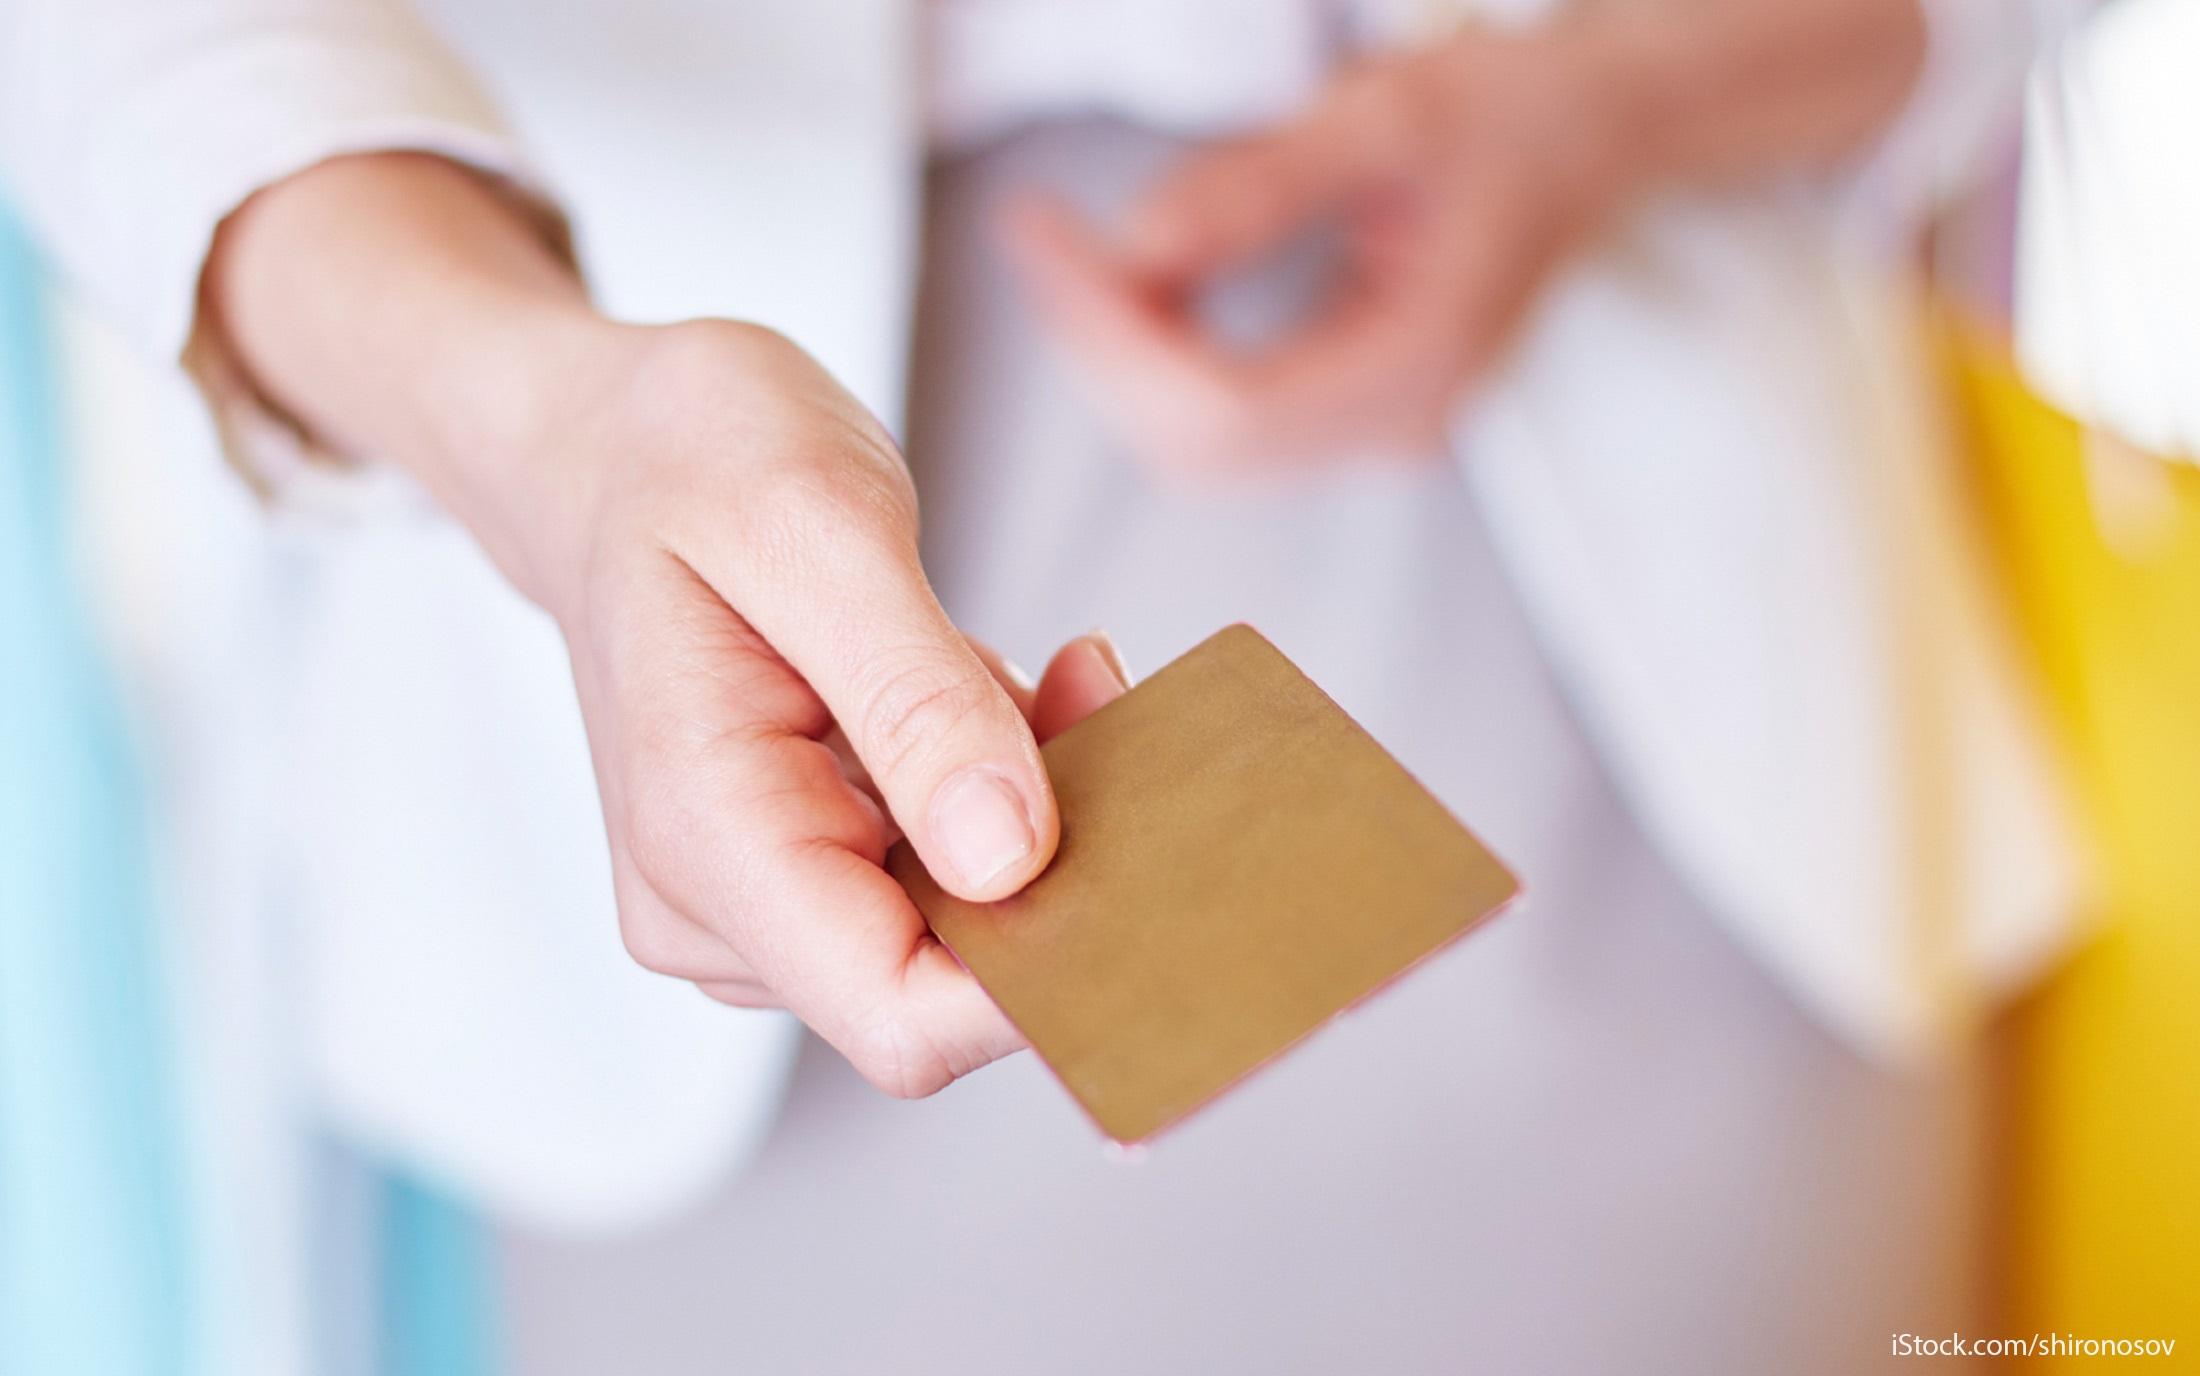 But how do you pick the best cash back credit card gobankingrates